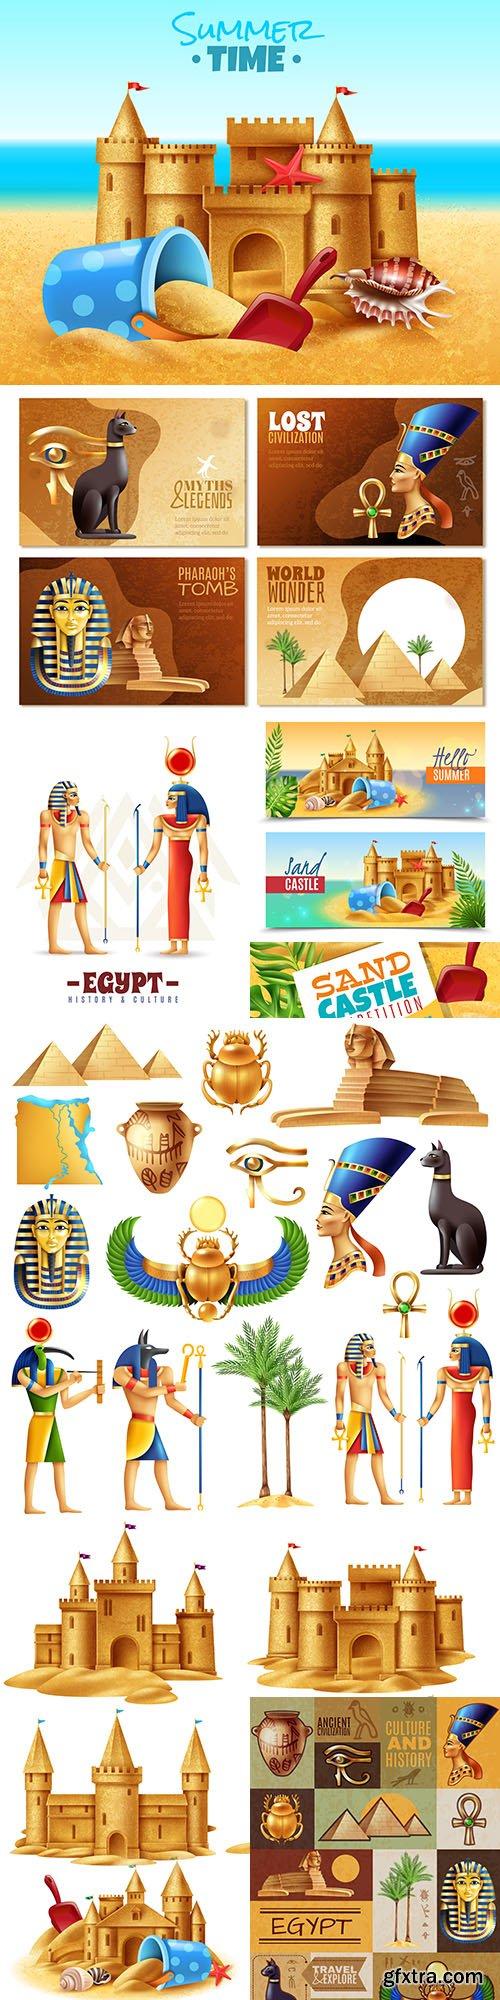 Castle sand and set Egypt symbols realistic illustrations